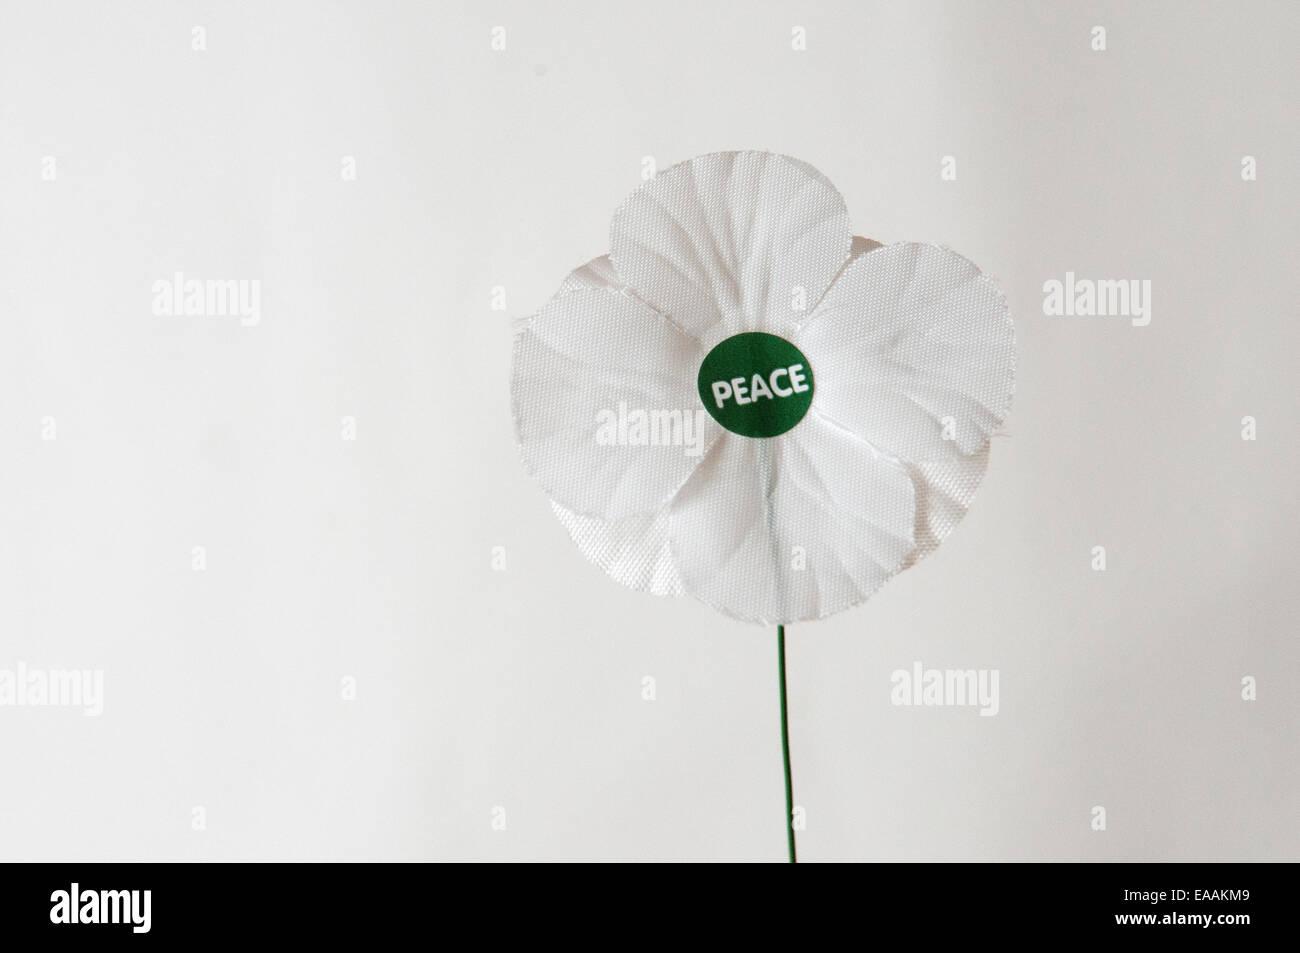 Coquelicot la paix blanche sur un fond blanc. Photo Stock